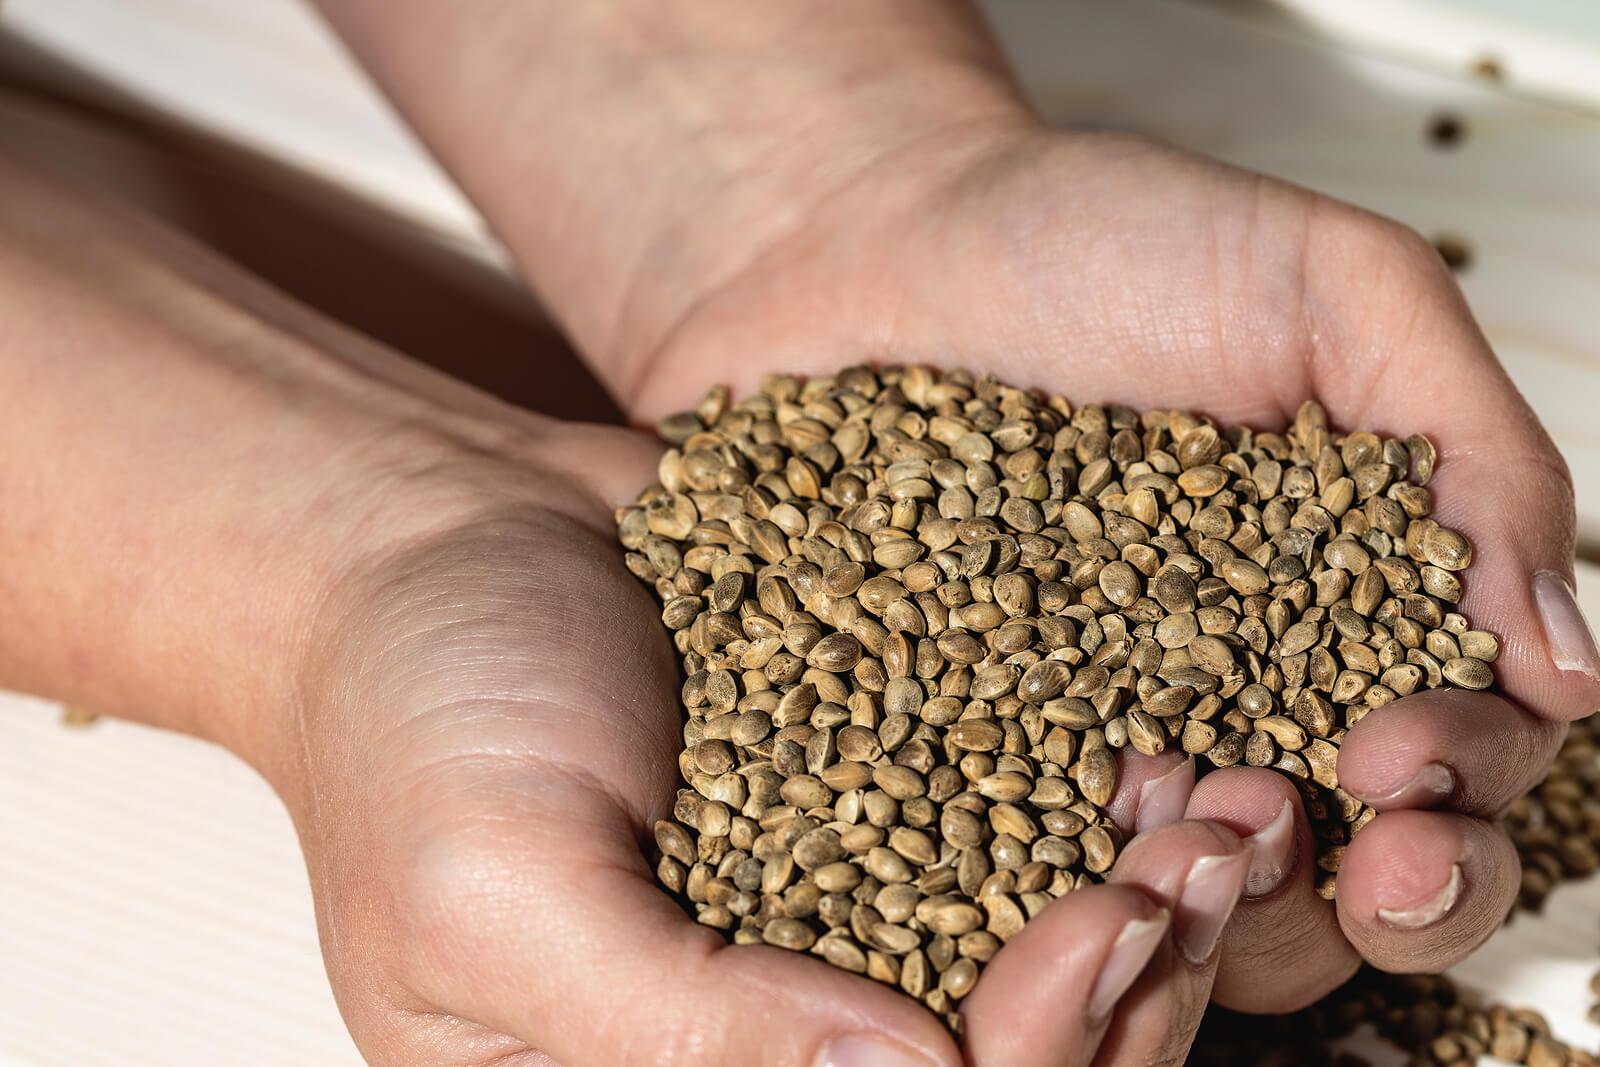 Buy Marijuana Seeds In Grand Blanc Township